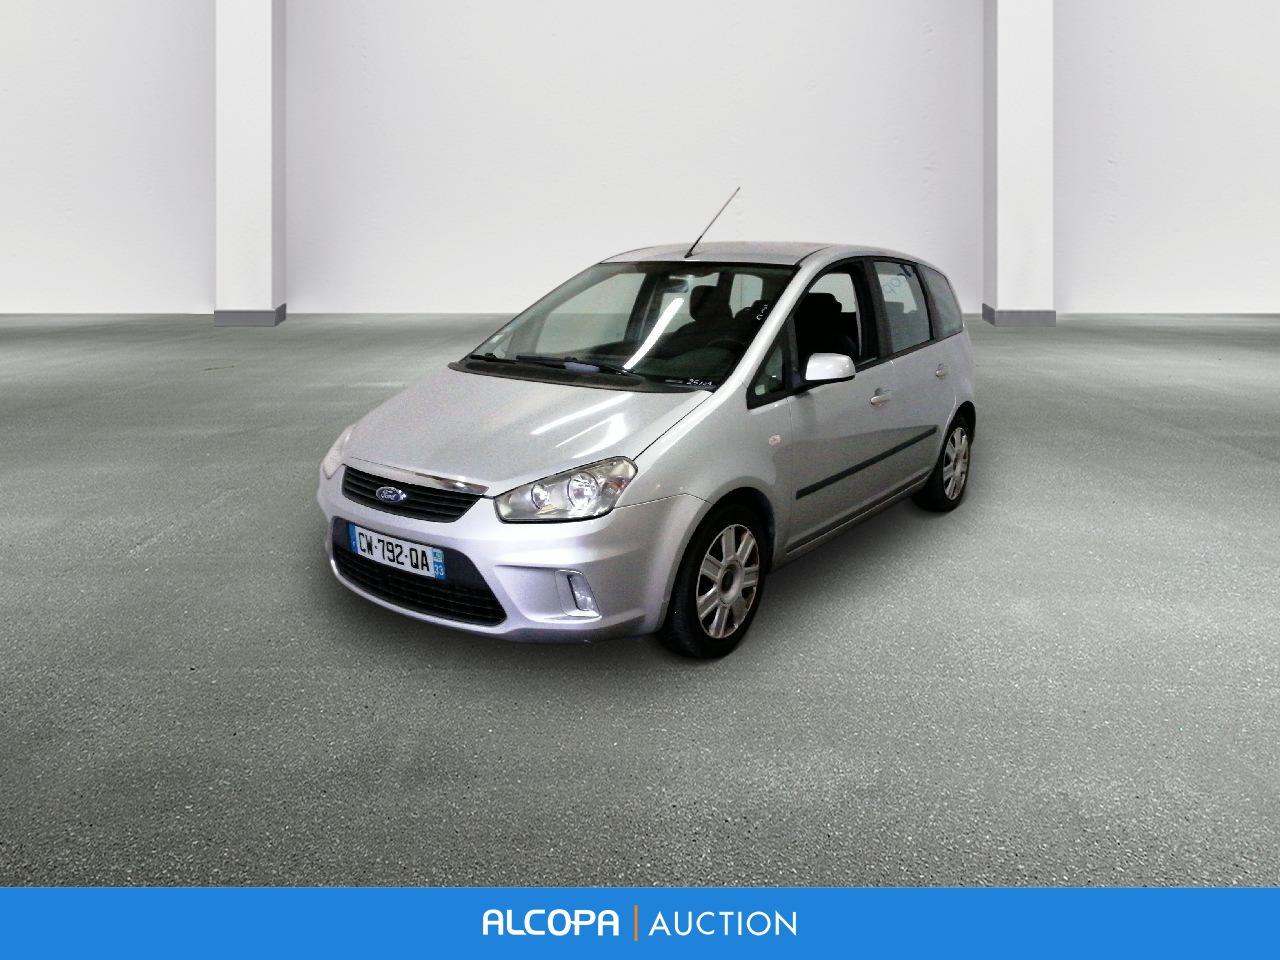 ford c max c max 1 6 tdci 110 dpf trend alcopa auction rh alcopa auction fr